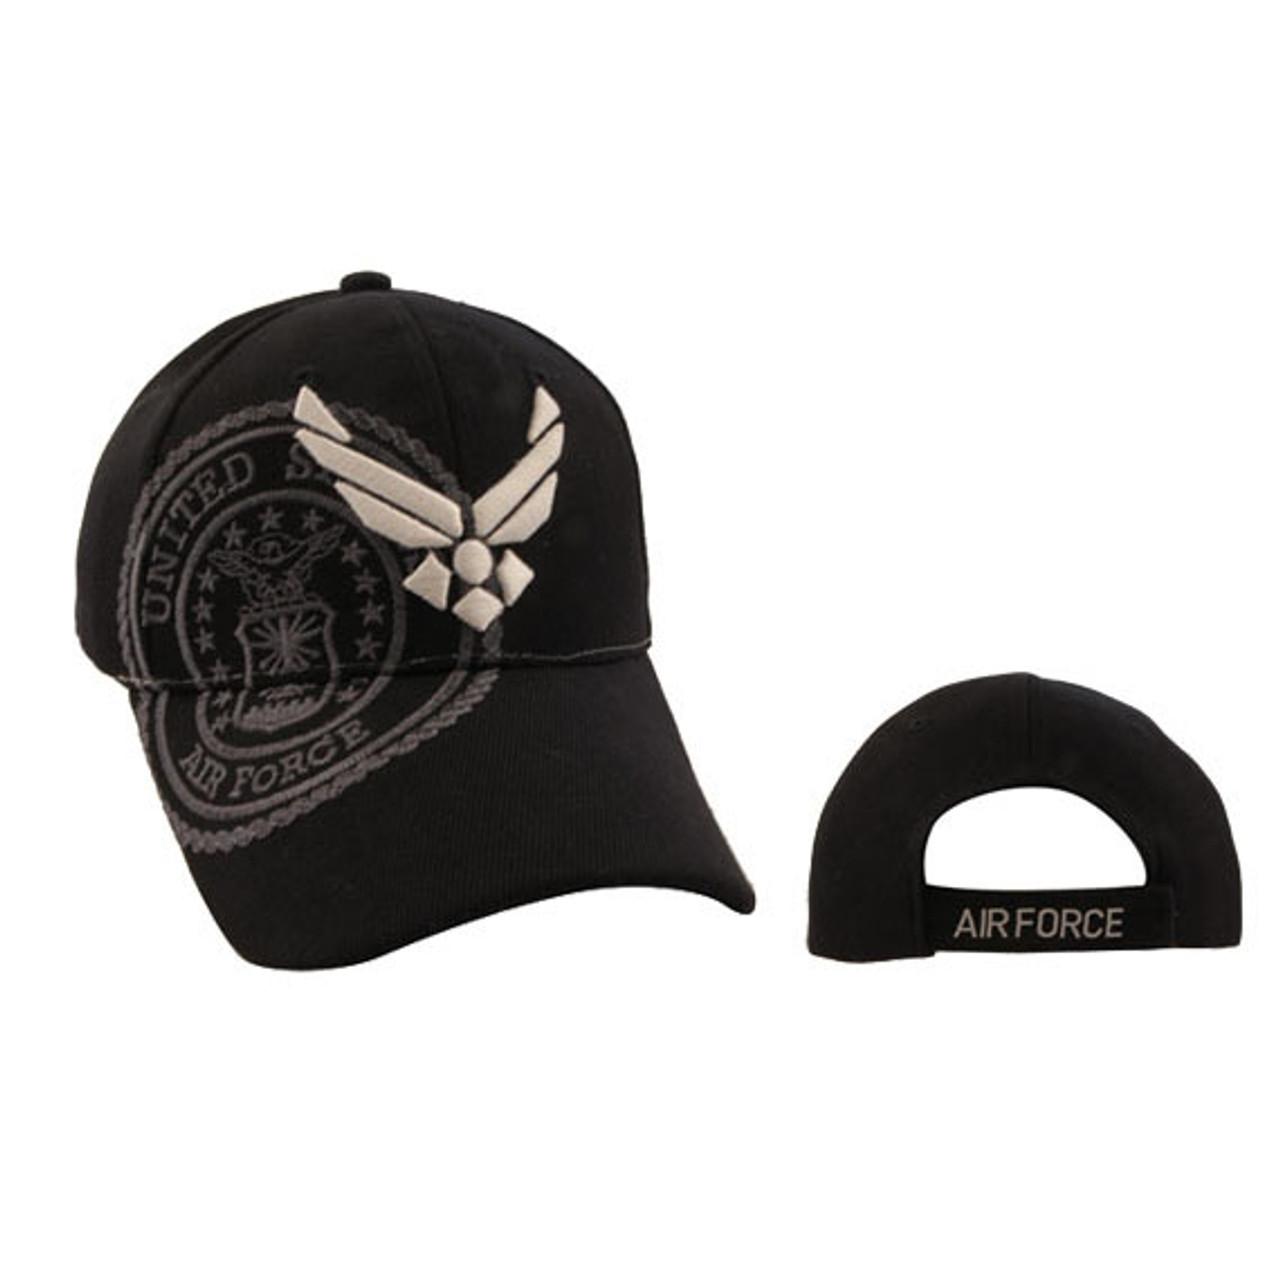 "Wholesale Baseball Cap ""U.S. Air Force"" C1047 (1 pc.)"